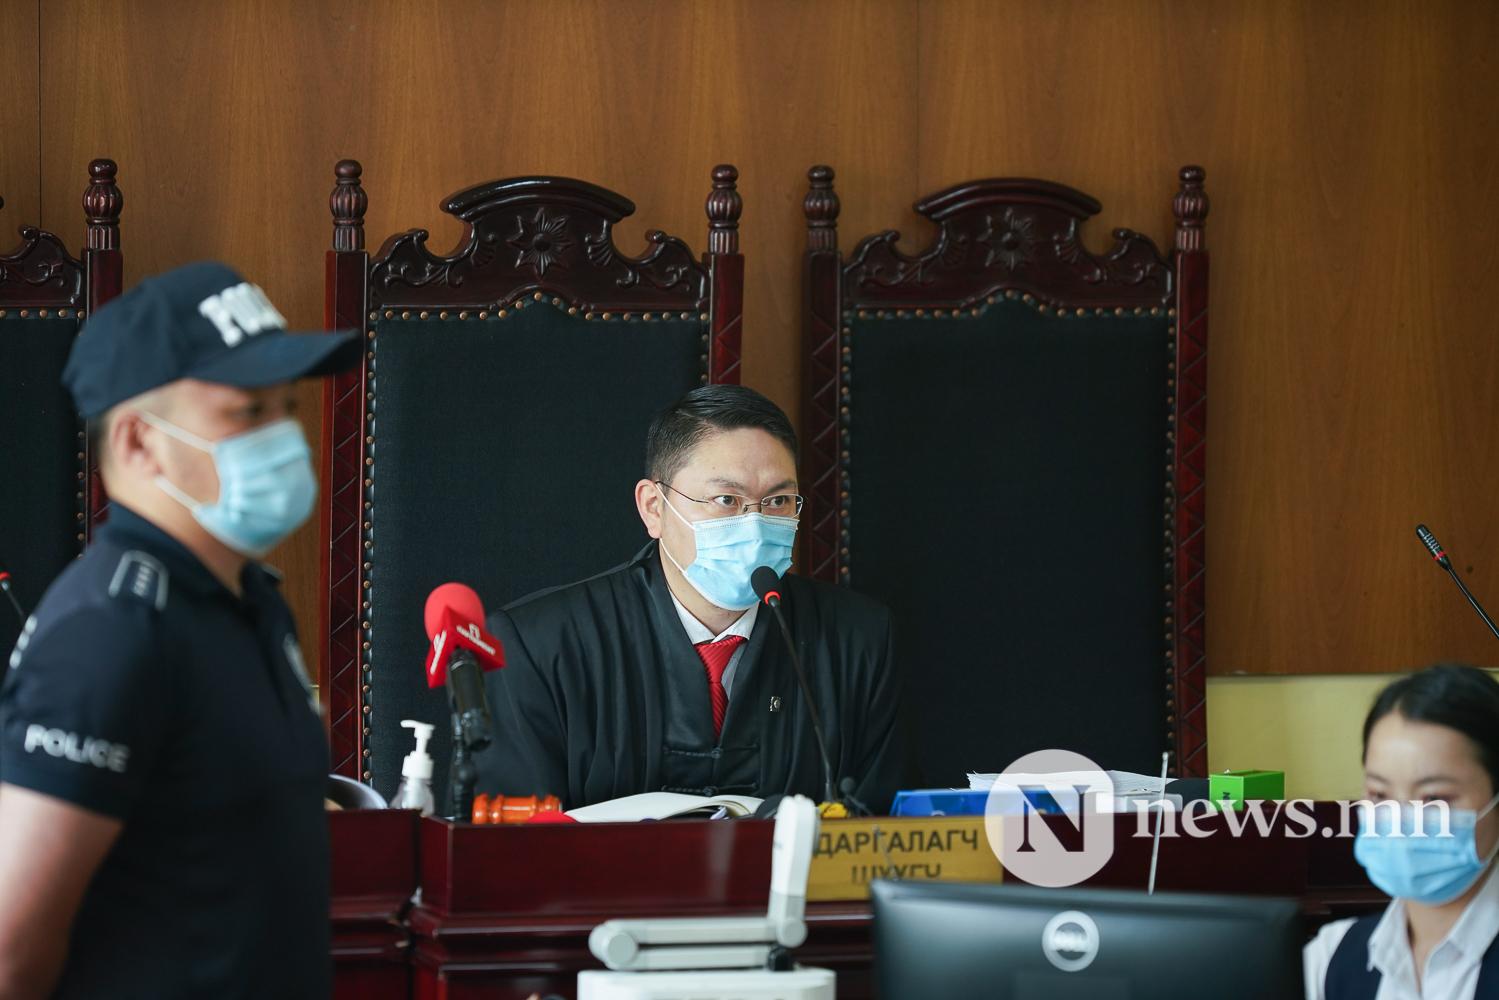 Ж. Эрдэнэбат шүүх хурал 07-02 (16 of 21)